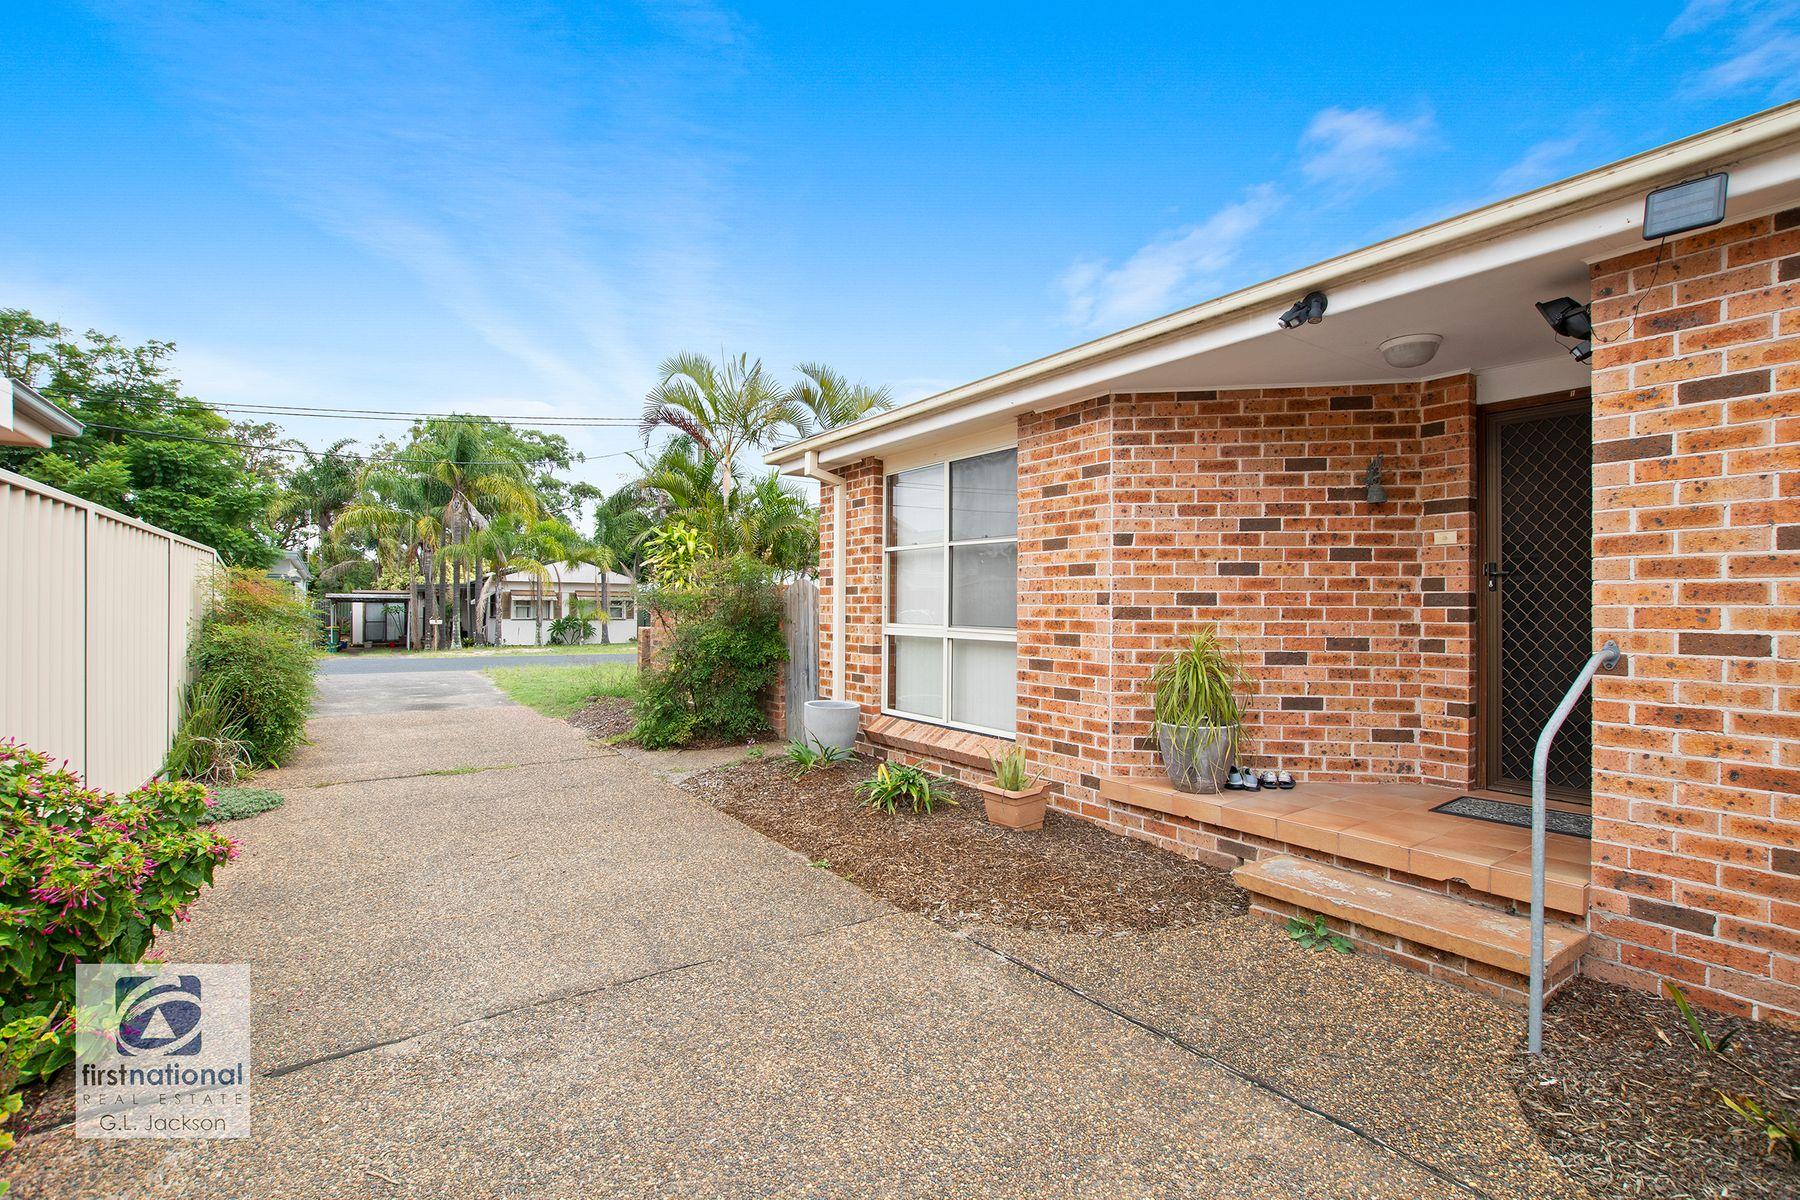 1/43 Bangalow Street, Ettalong Beach, NSW 2257